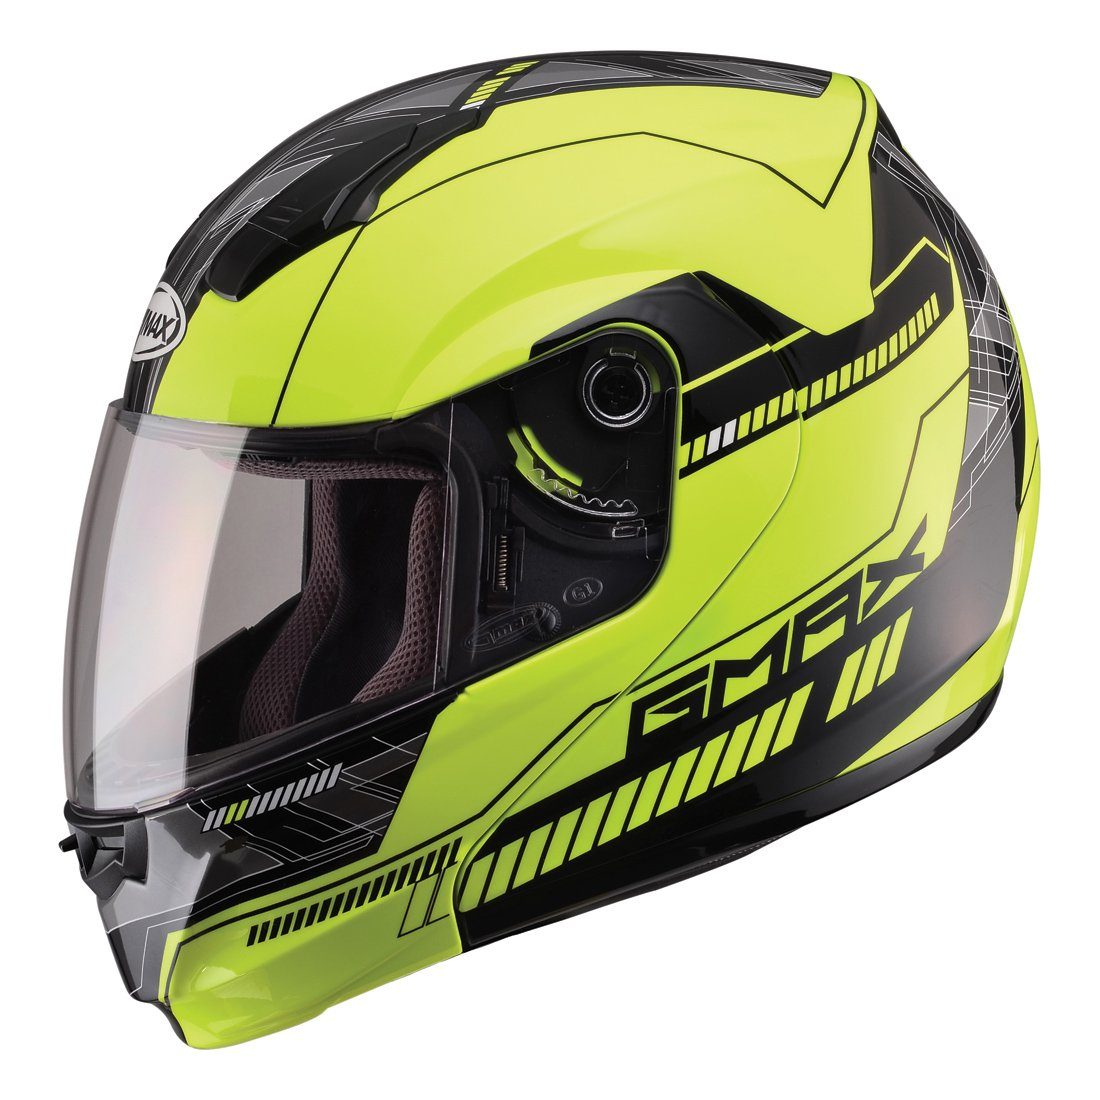 GMAX Unisex-Adult Full-face Style G1041689 TC-24 04 Modular Street Helmet Hi-Vis Yellow//Black 3x XXX-Large G1041689TC-24